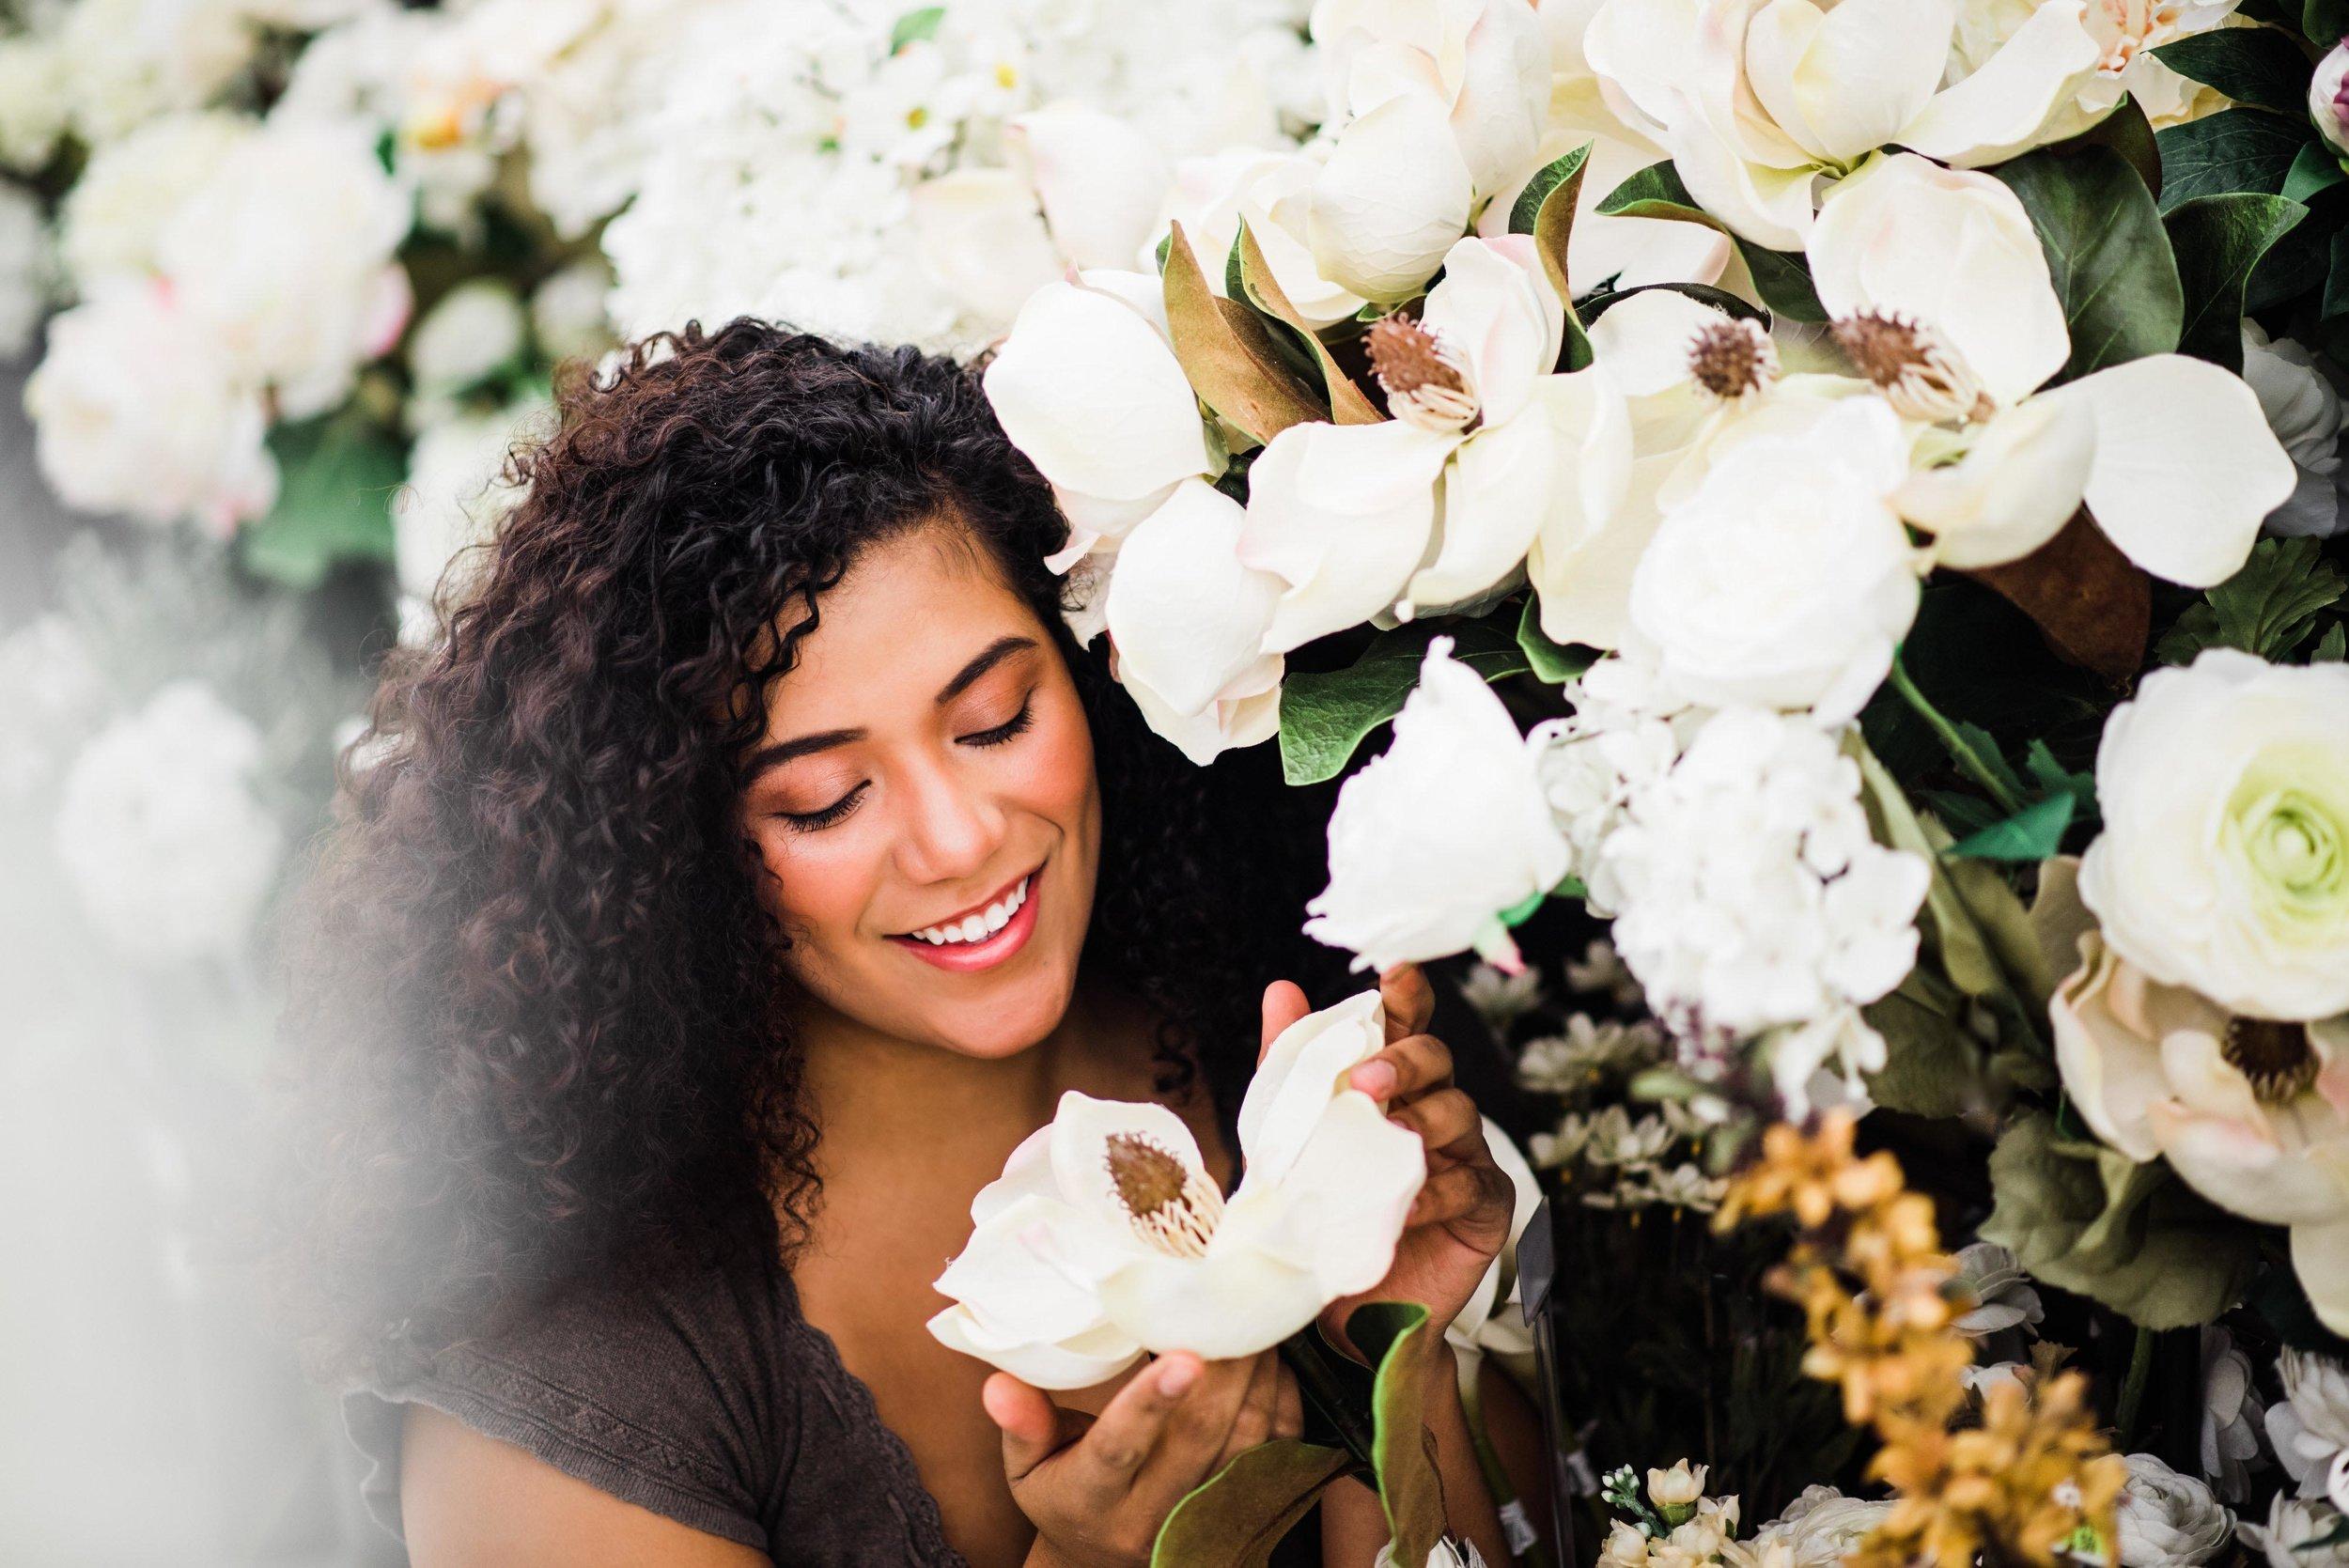 The Craft Store Photo Challenge Pittsburgh Wedding Portrait